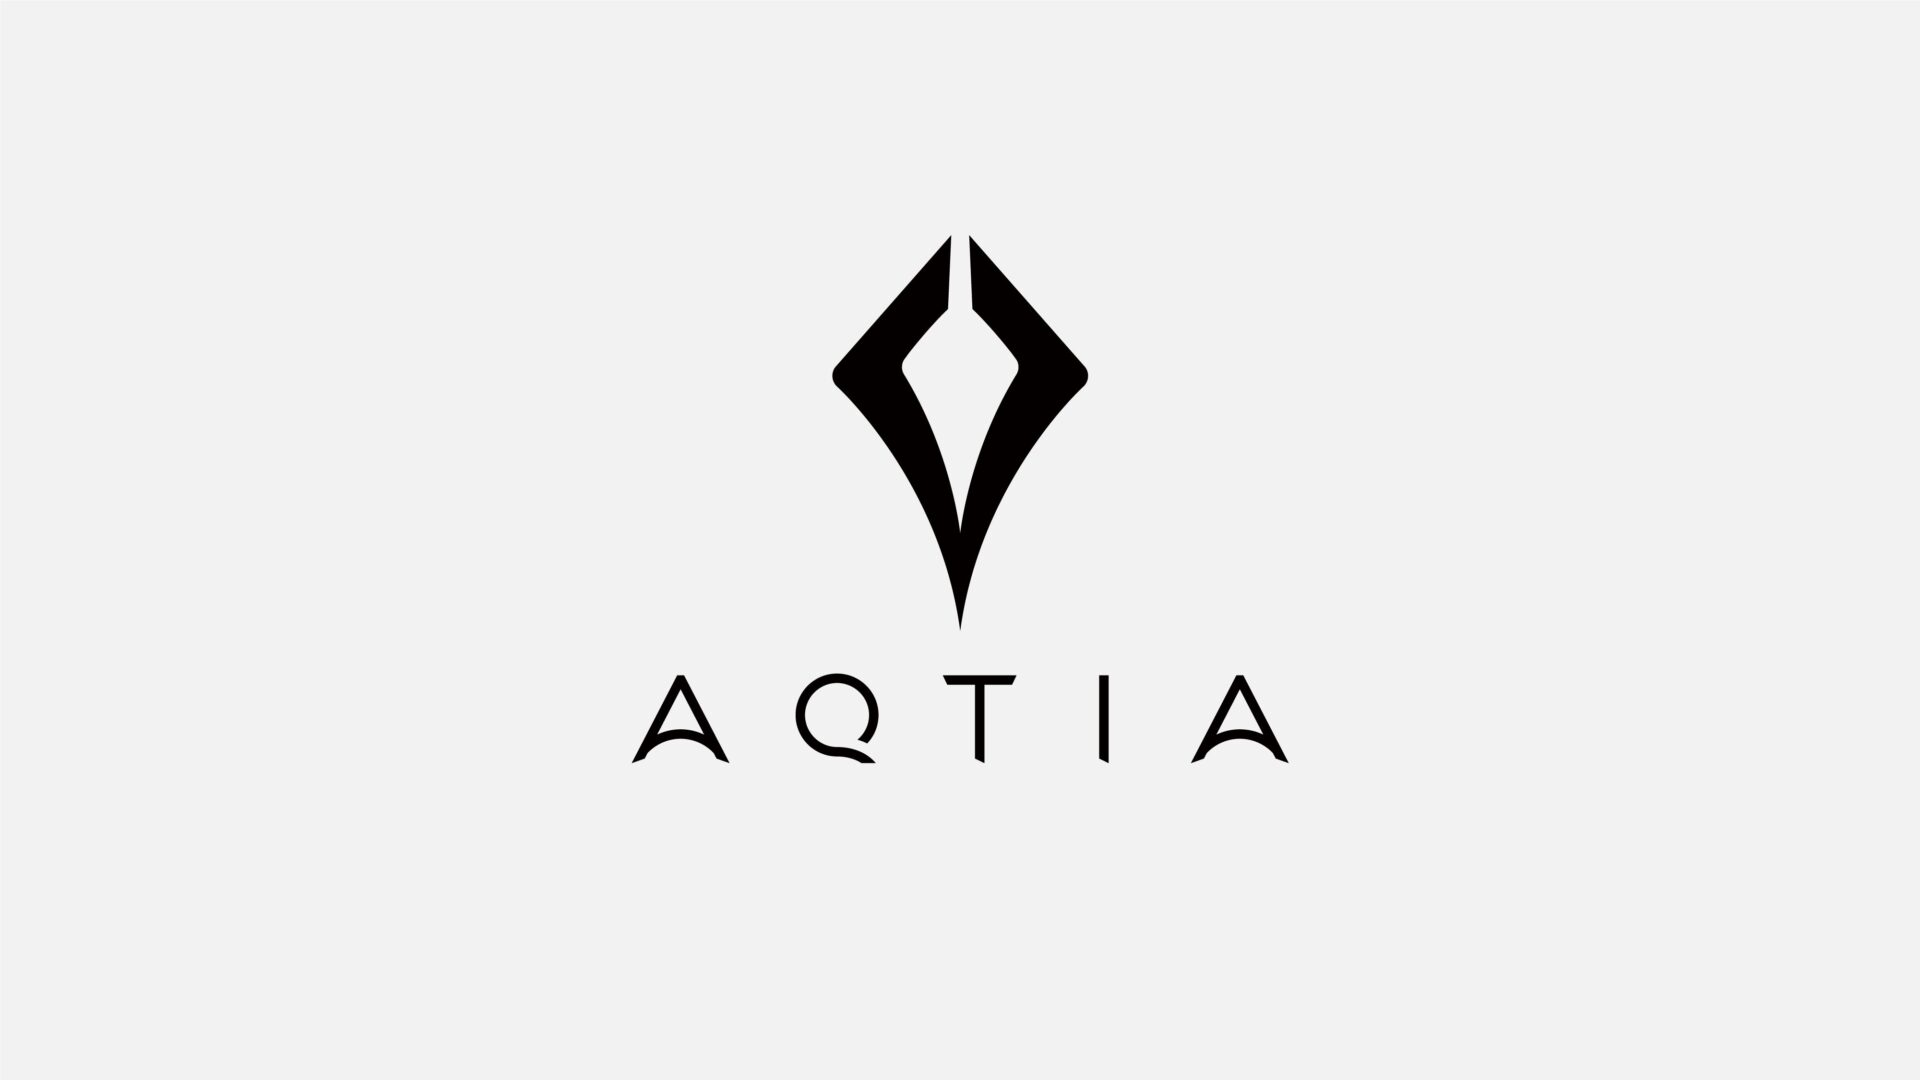 「AQTIA」のサムネイル画像